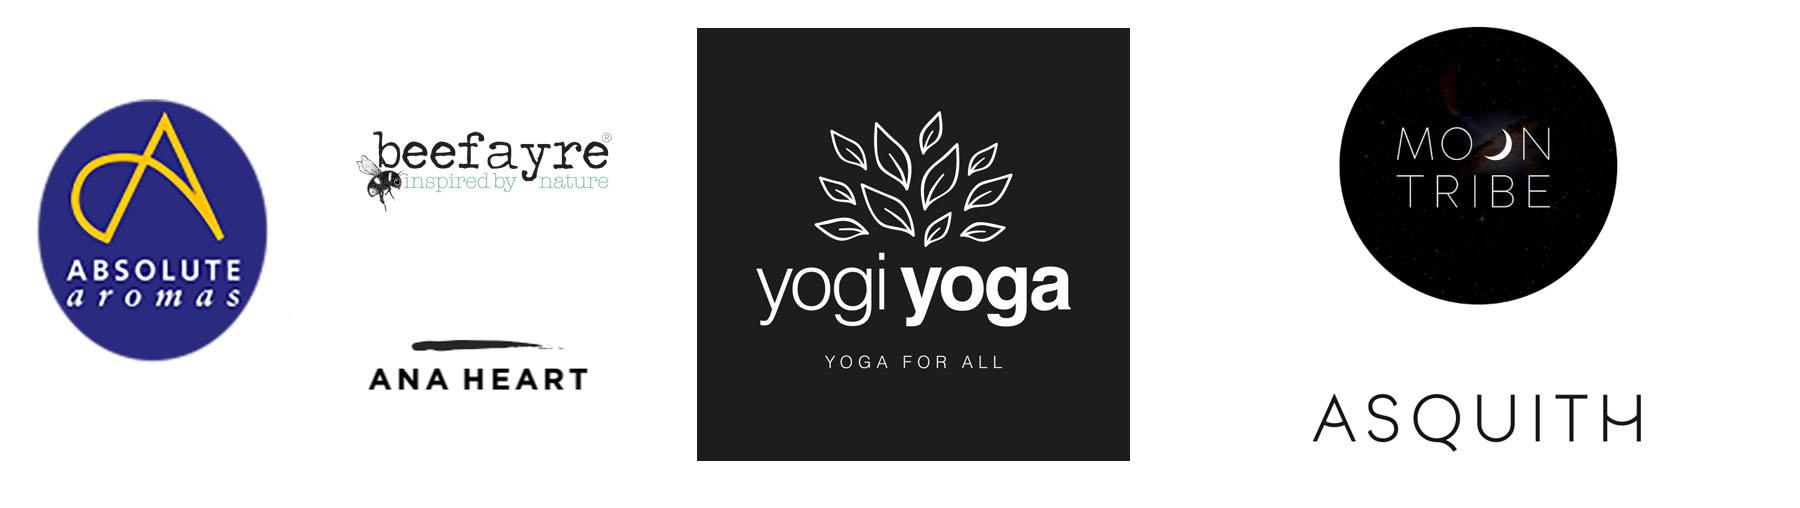 yogiyoga retail shop online banner